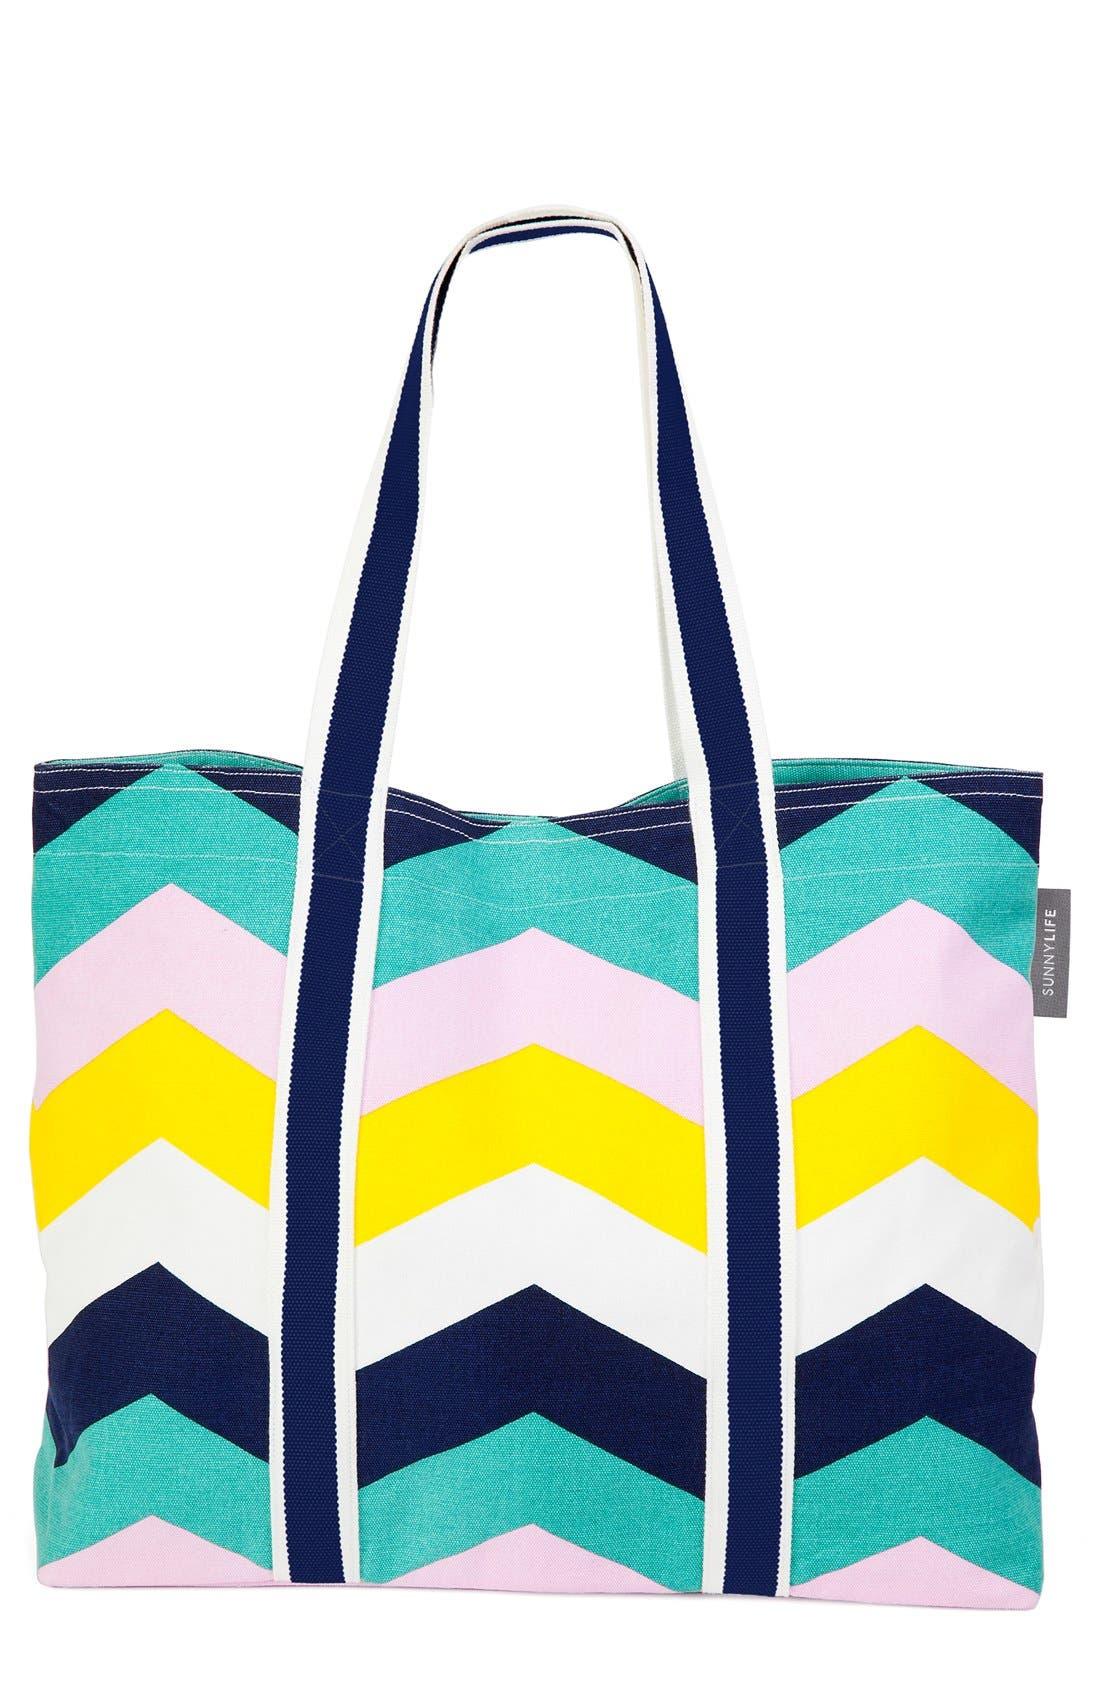 Alternate Image 1 Selected - Sunnylife 'Acapulco' Tote Bag